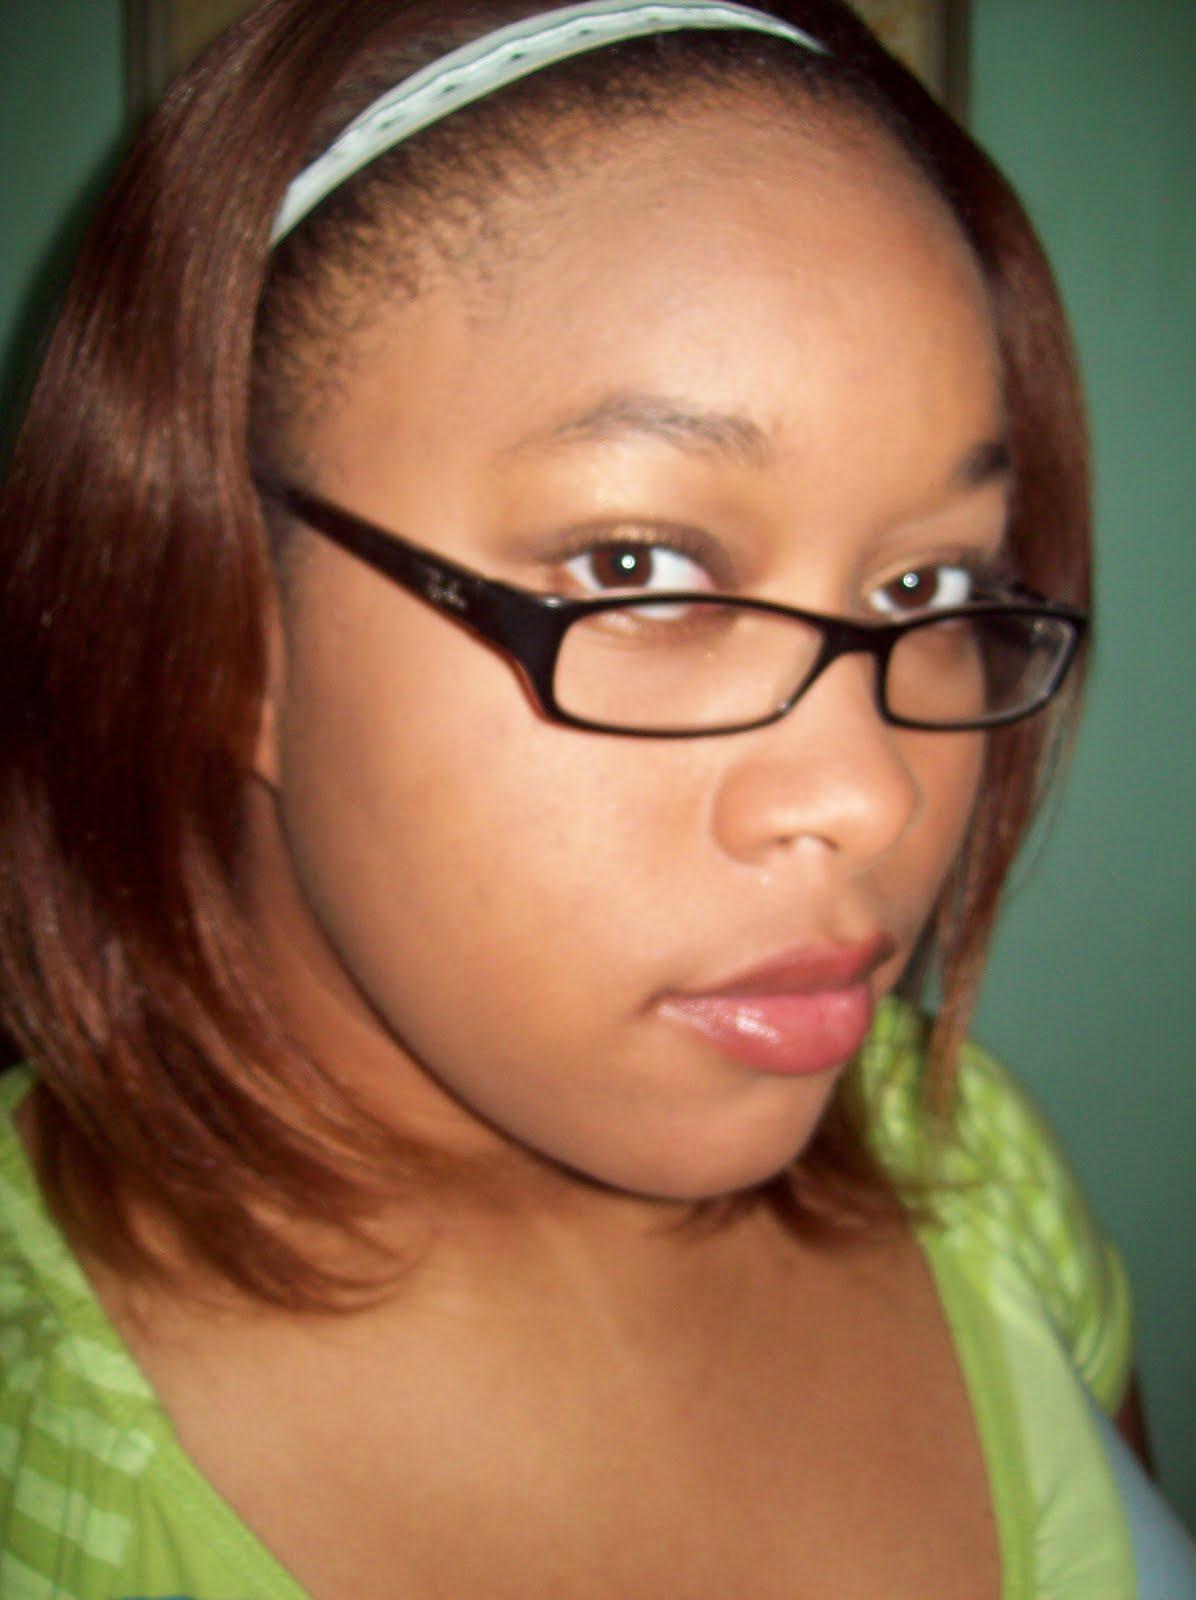 Christa- A Story of Transition